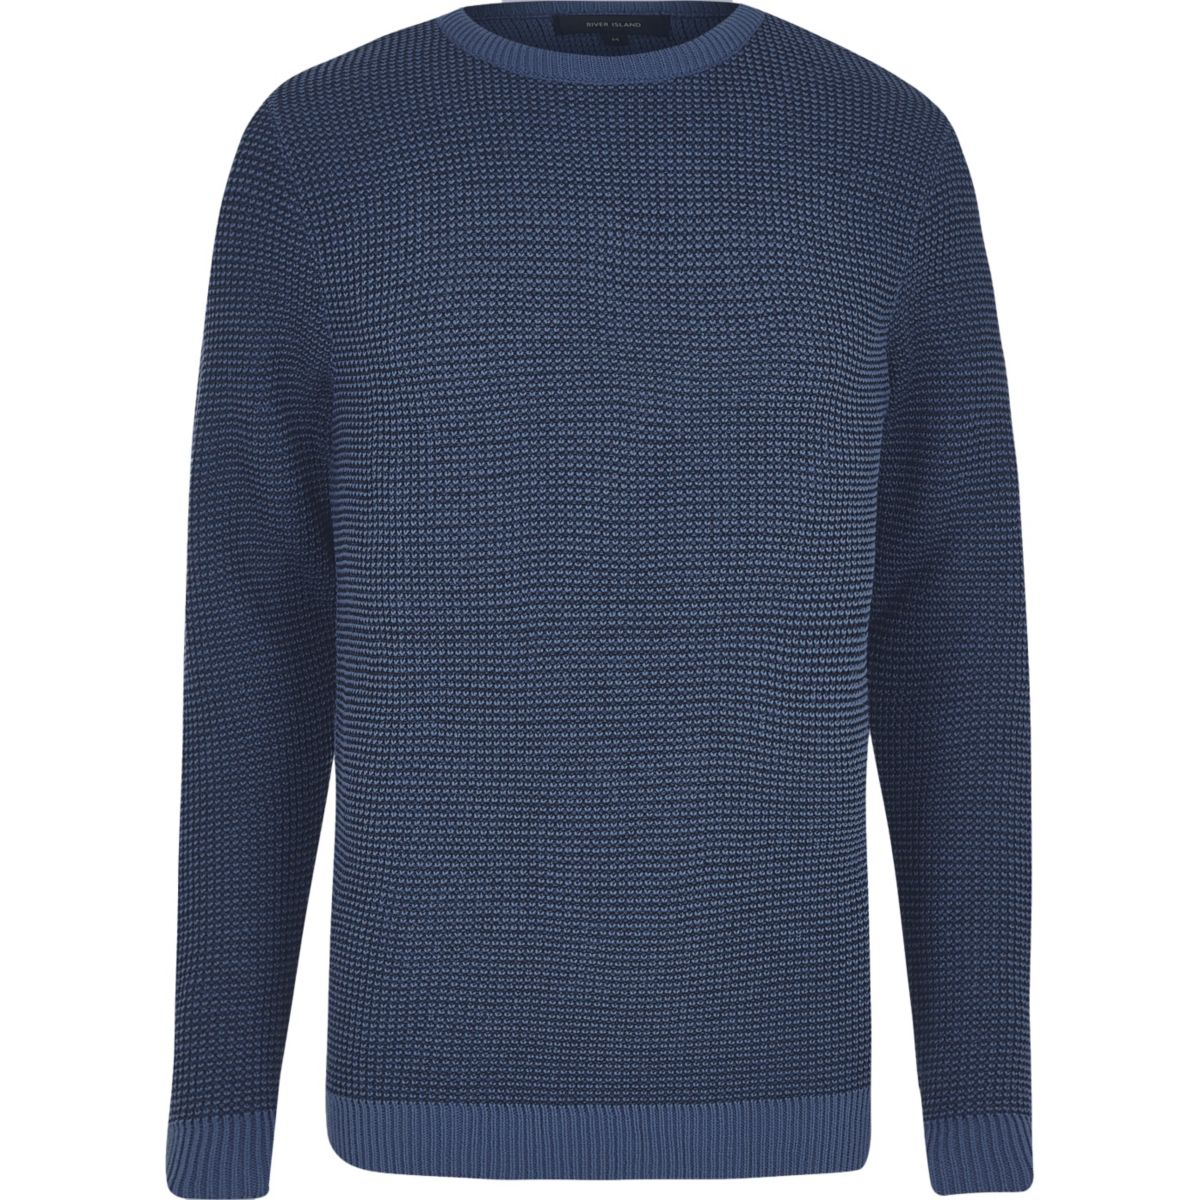 Navy textured knit slim fit jumper